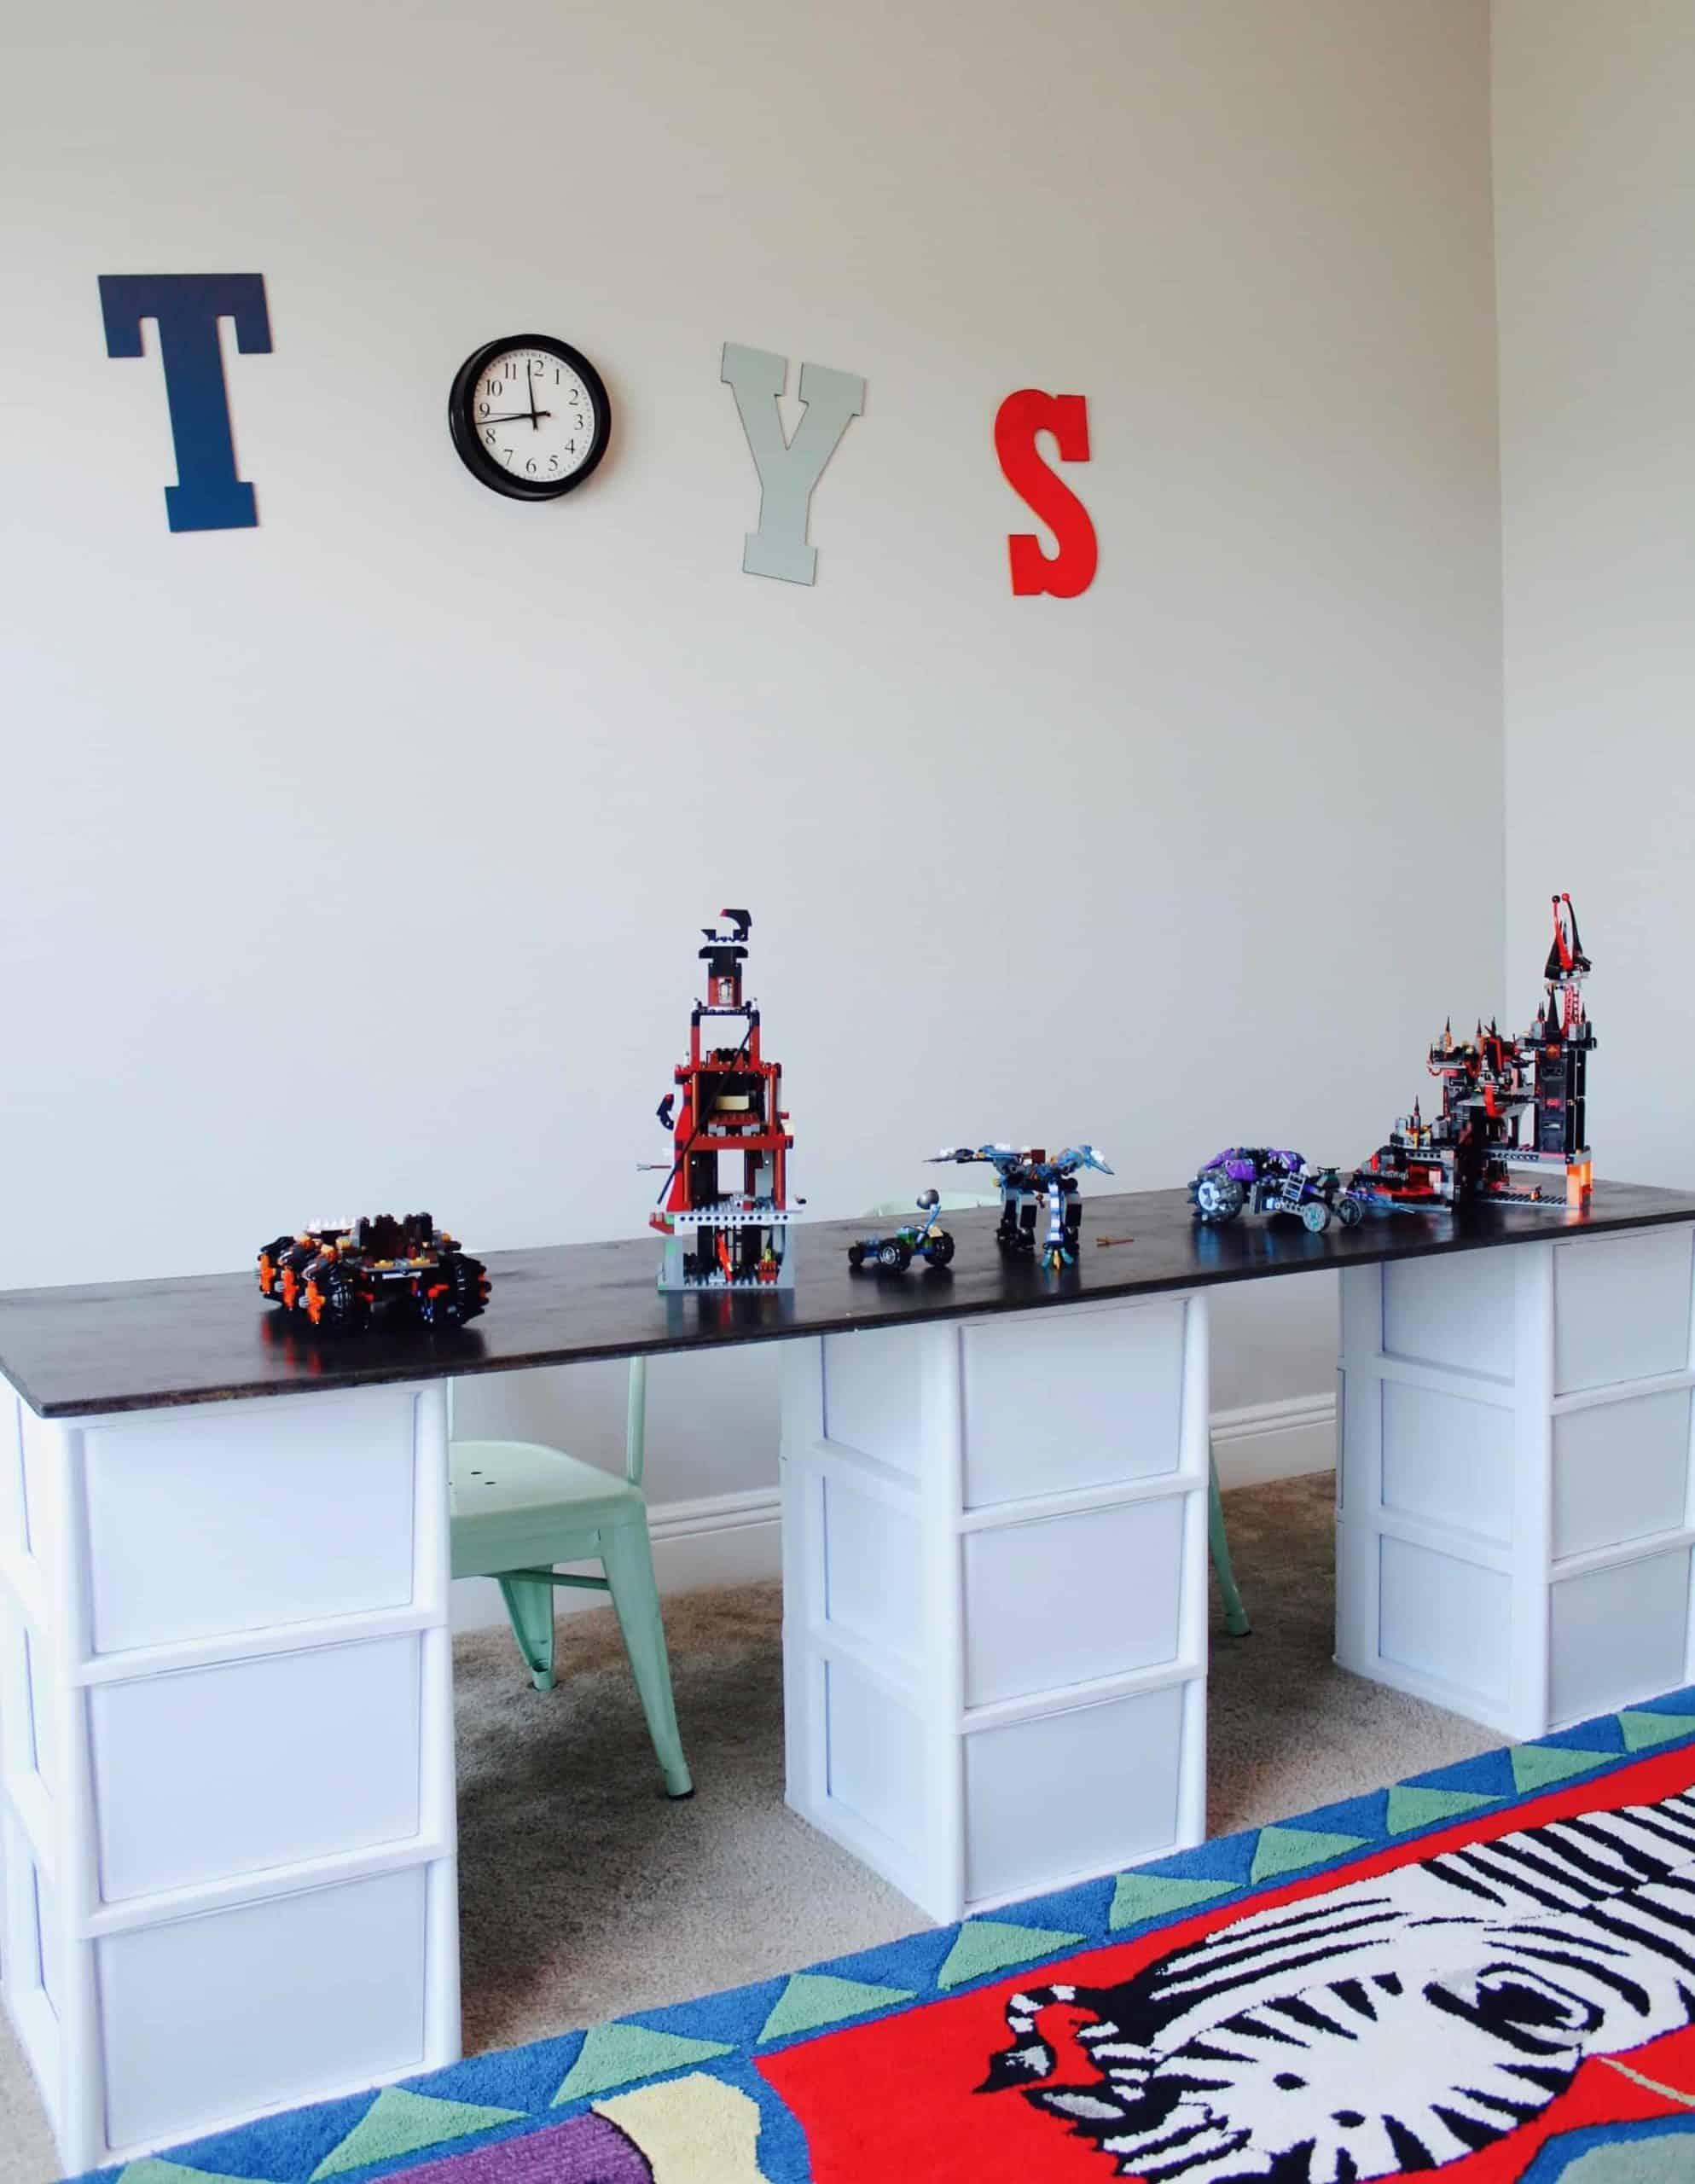 Lego storage ideas 8 scaled 1 the best lego storage ideas (plus storage ideas for built sets